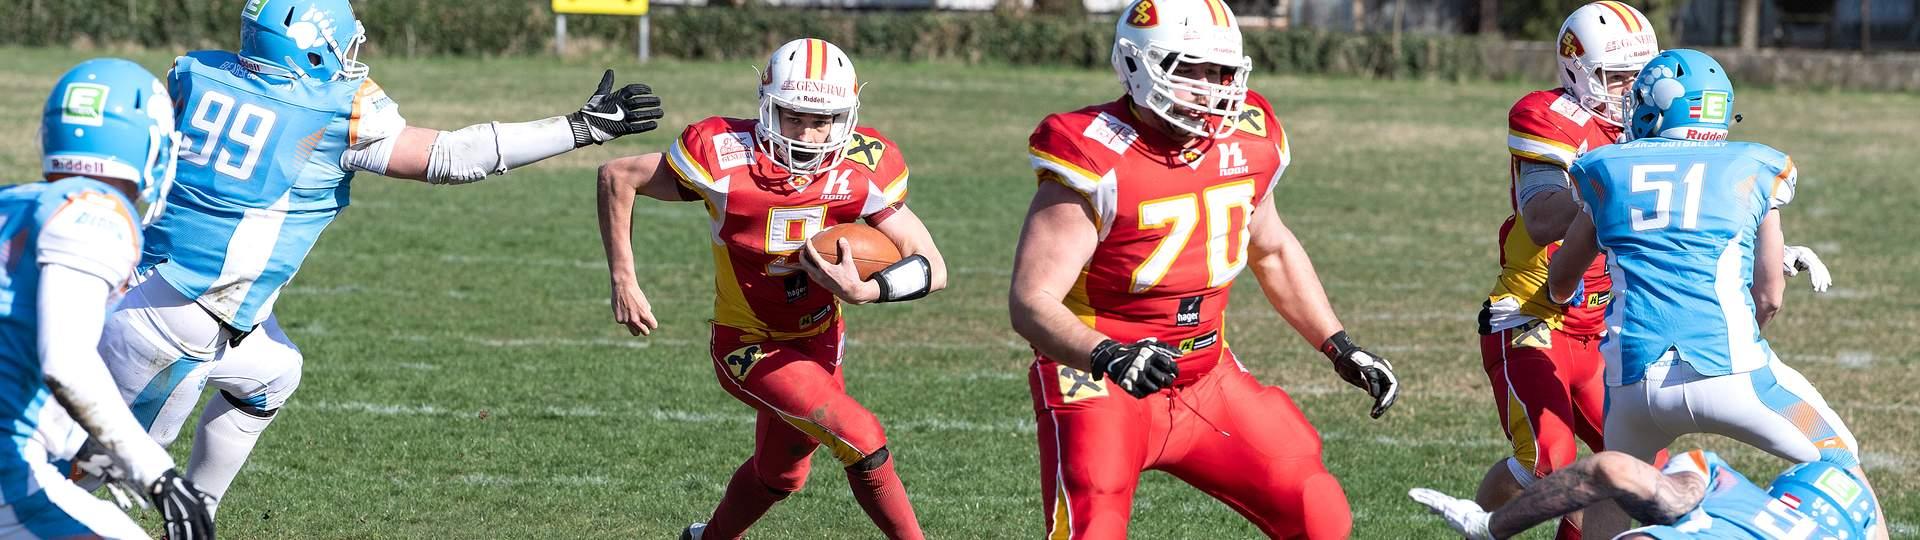 St. Pölten Invaders American Football gegen Styrian Bears